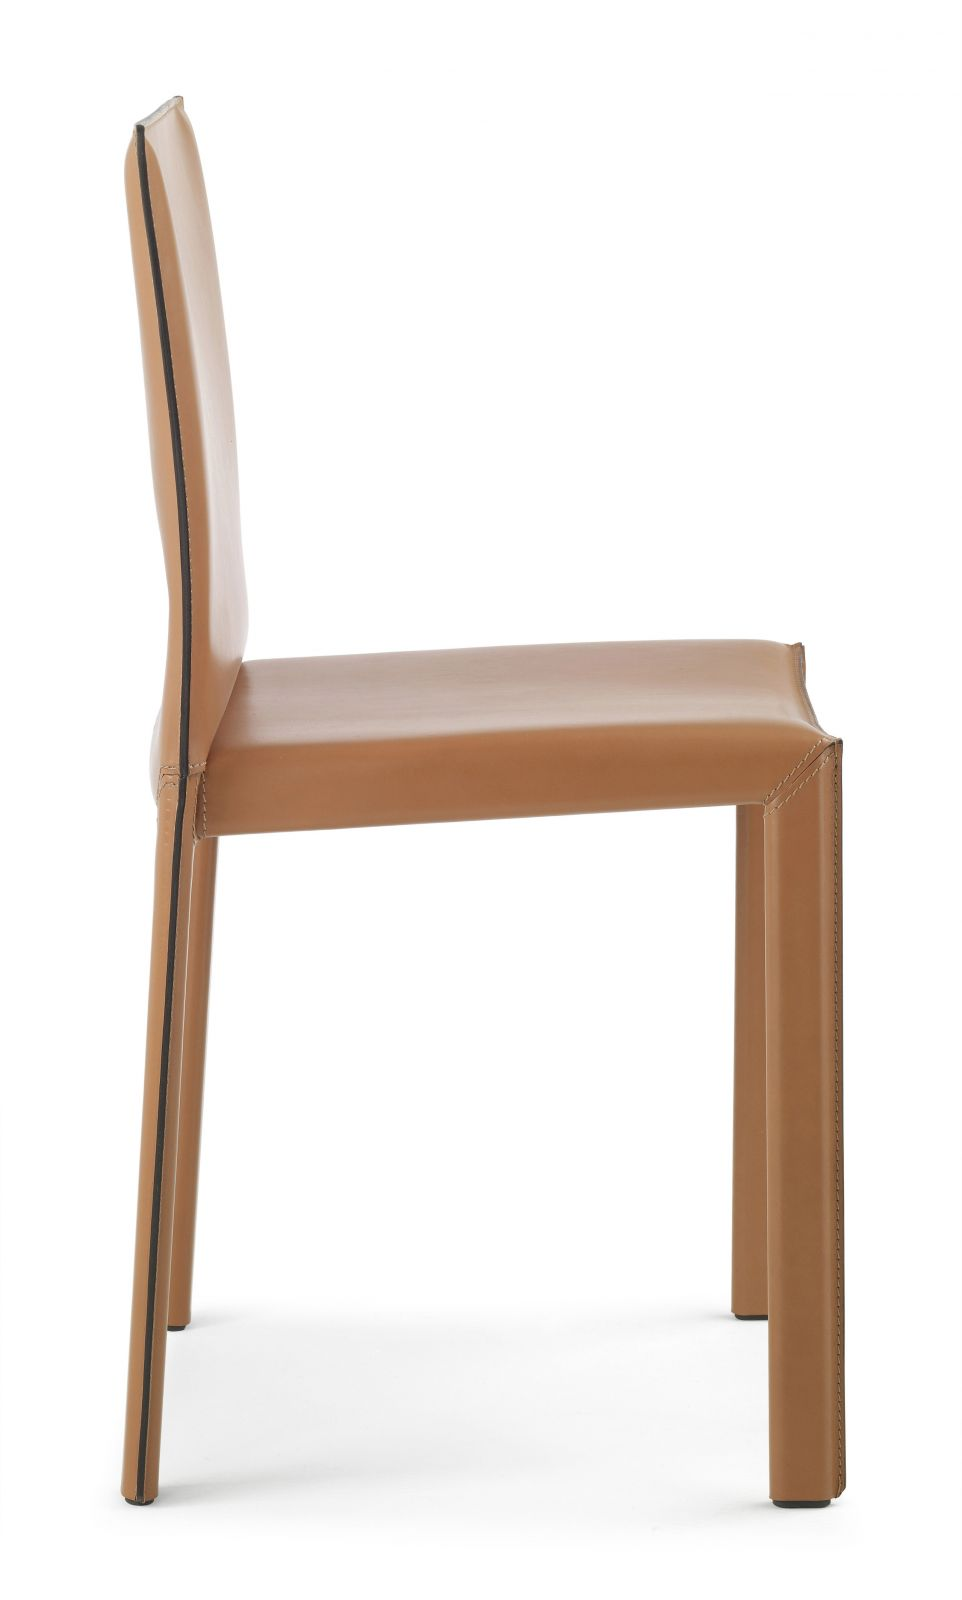 modern-office-furniture-chairs-Italian-designer-furniture (31).jpg